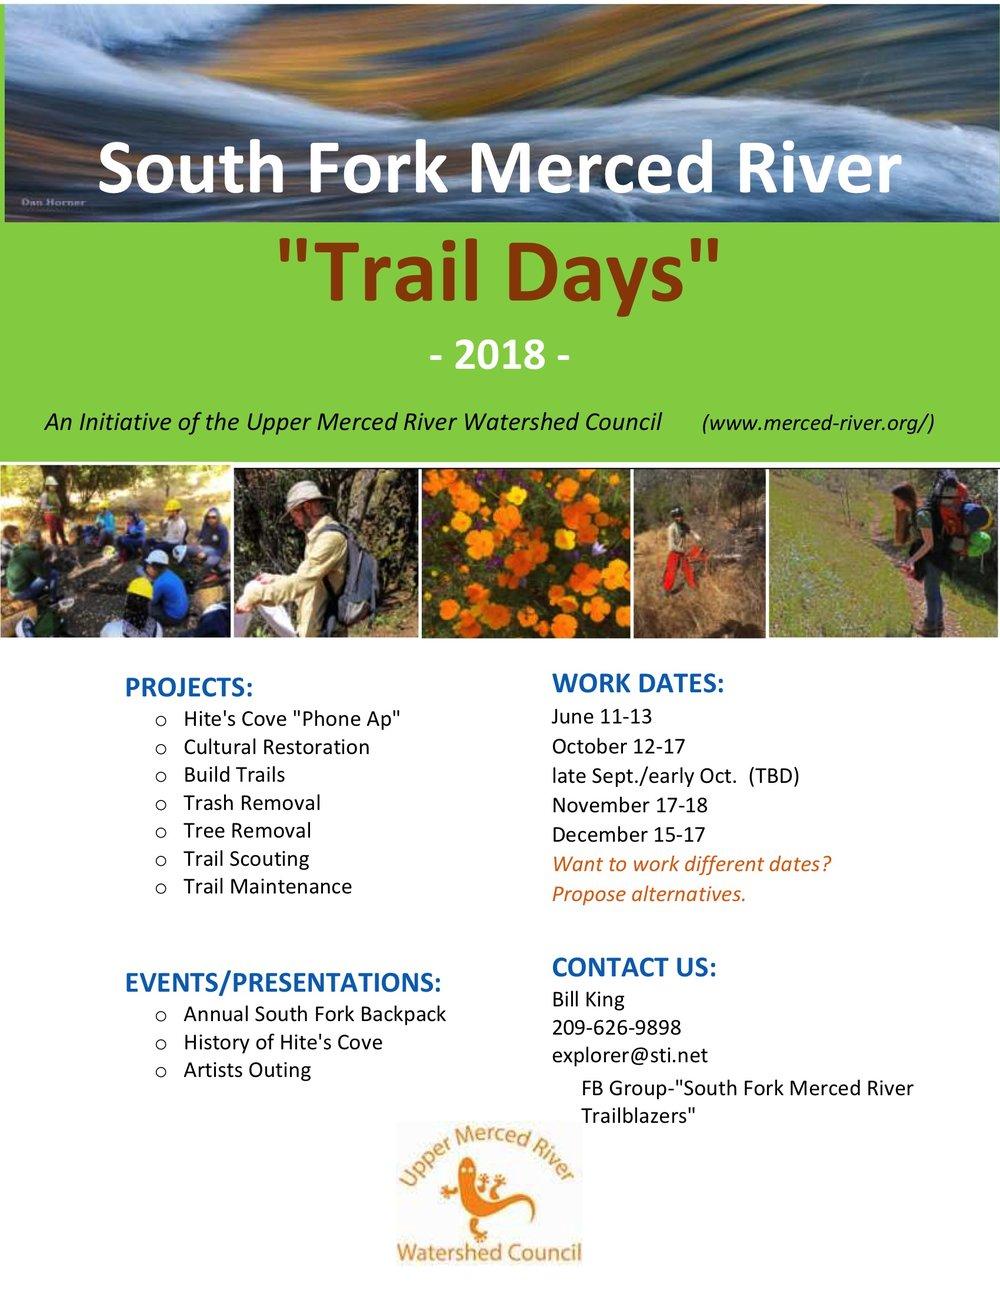 South Fork Merced River Flyer III.jpg